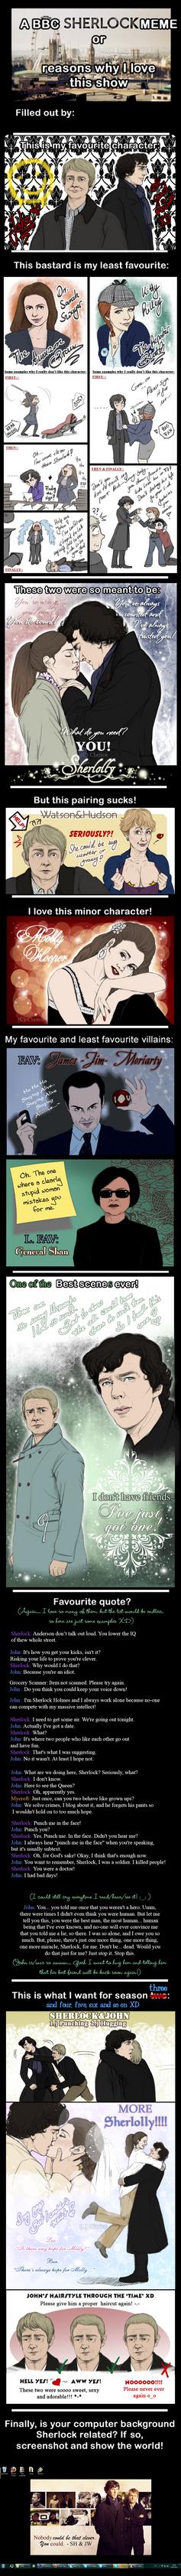 BBC Sherlock Meme by RedPassion